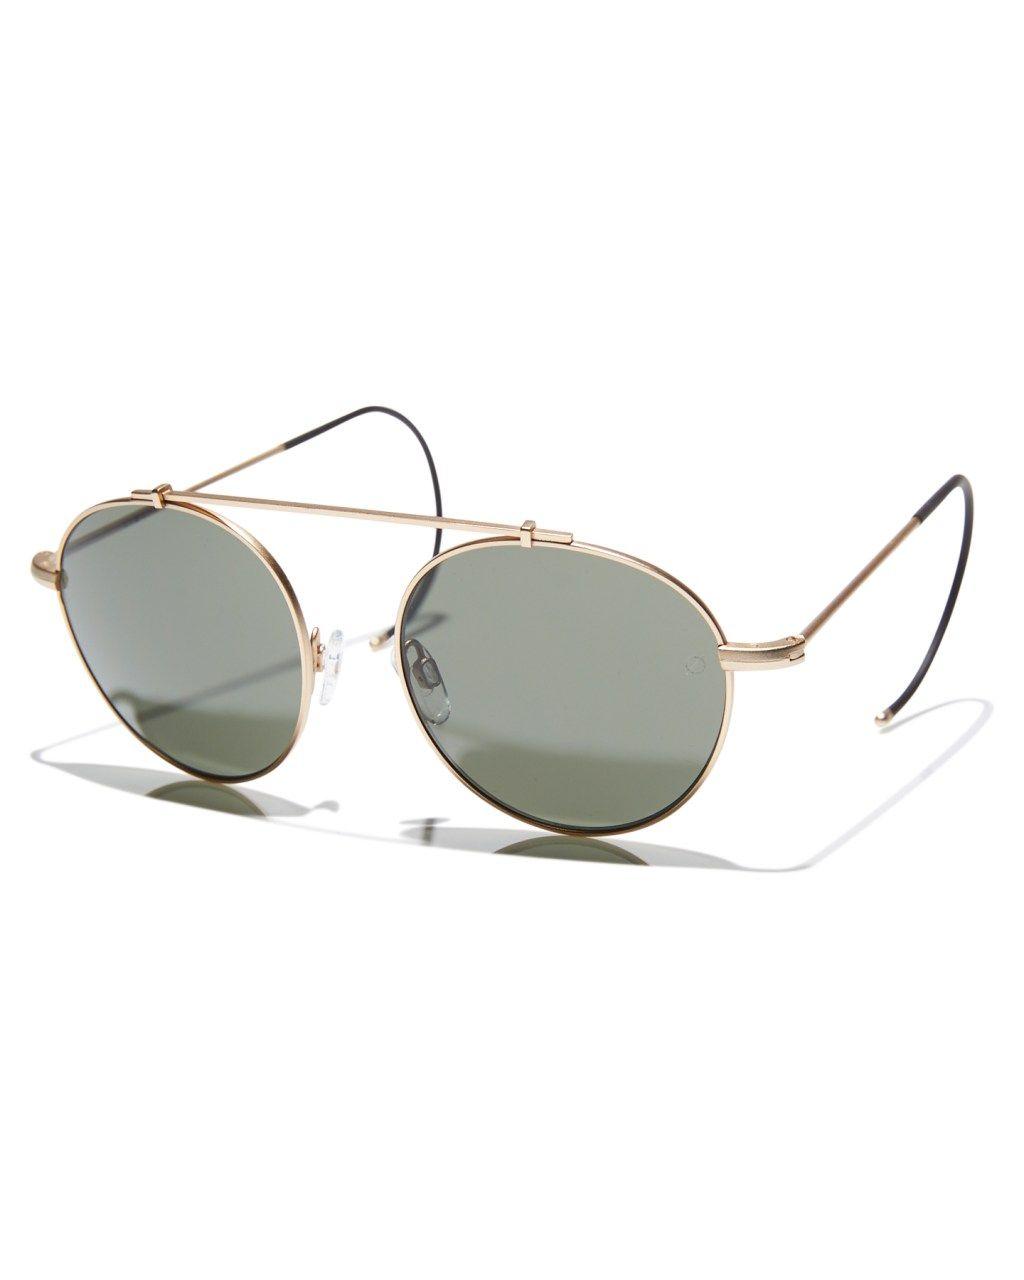 dbedf8089ec Epokhe Xoa Sunglasses Gold Antique Grey Mens sunglasses Size ...